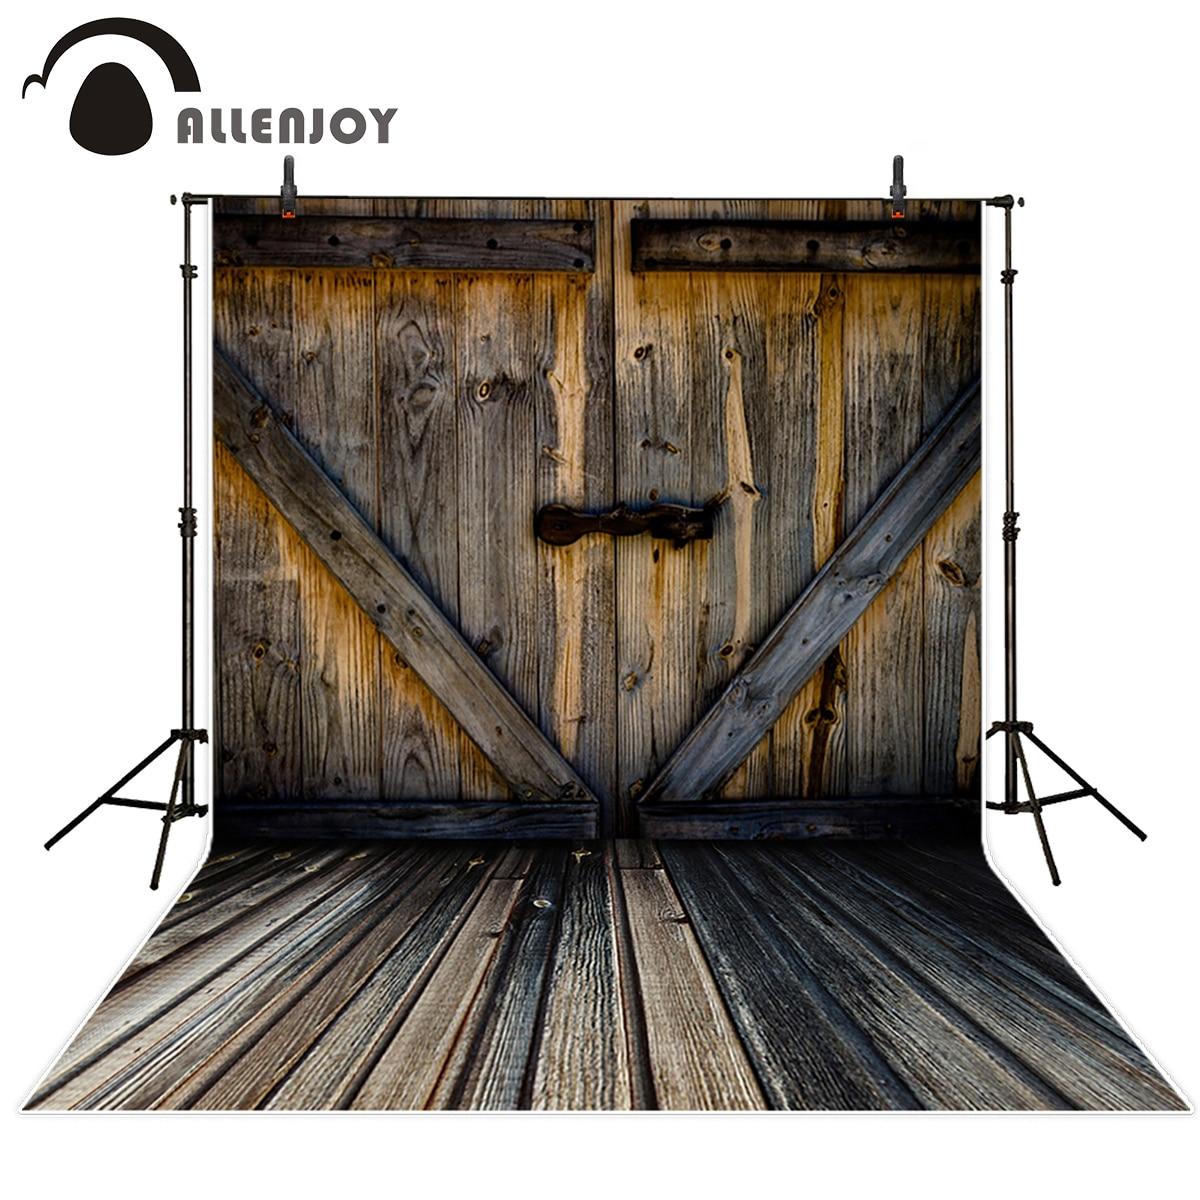 Allenjoy photography backdrops Wooden door vintage professional photo studio background vinyl backdrops for photography